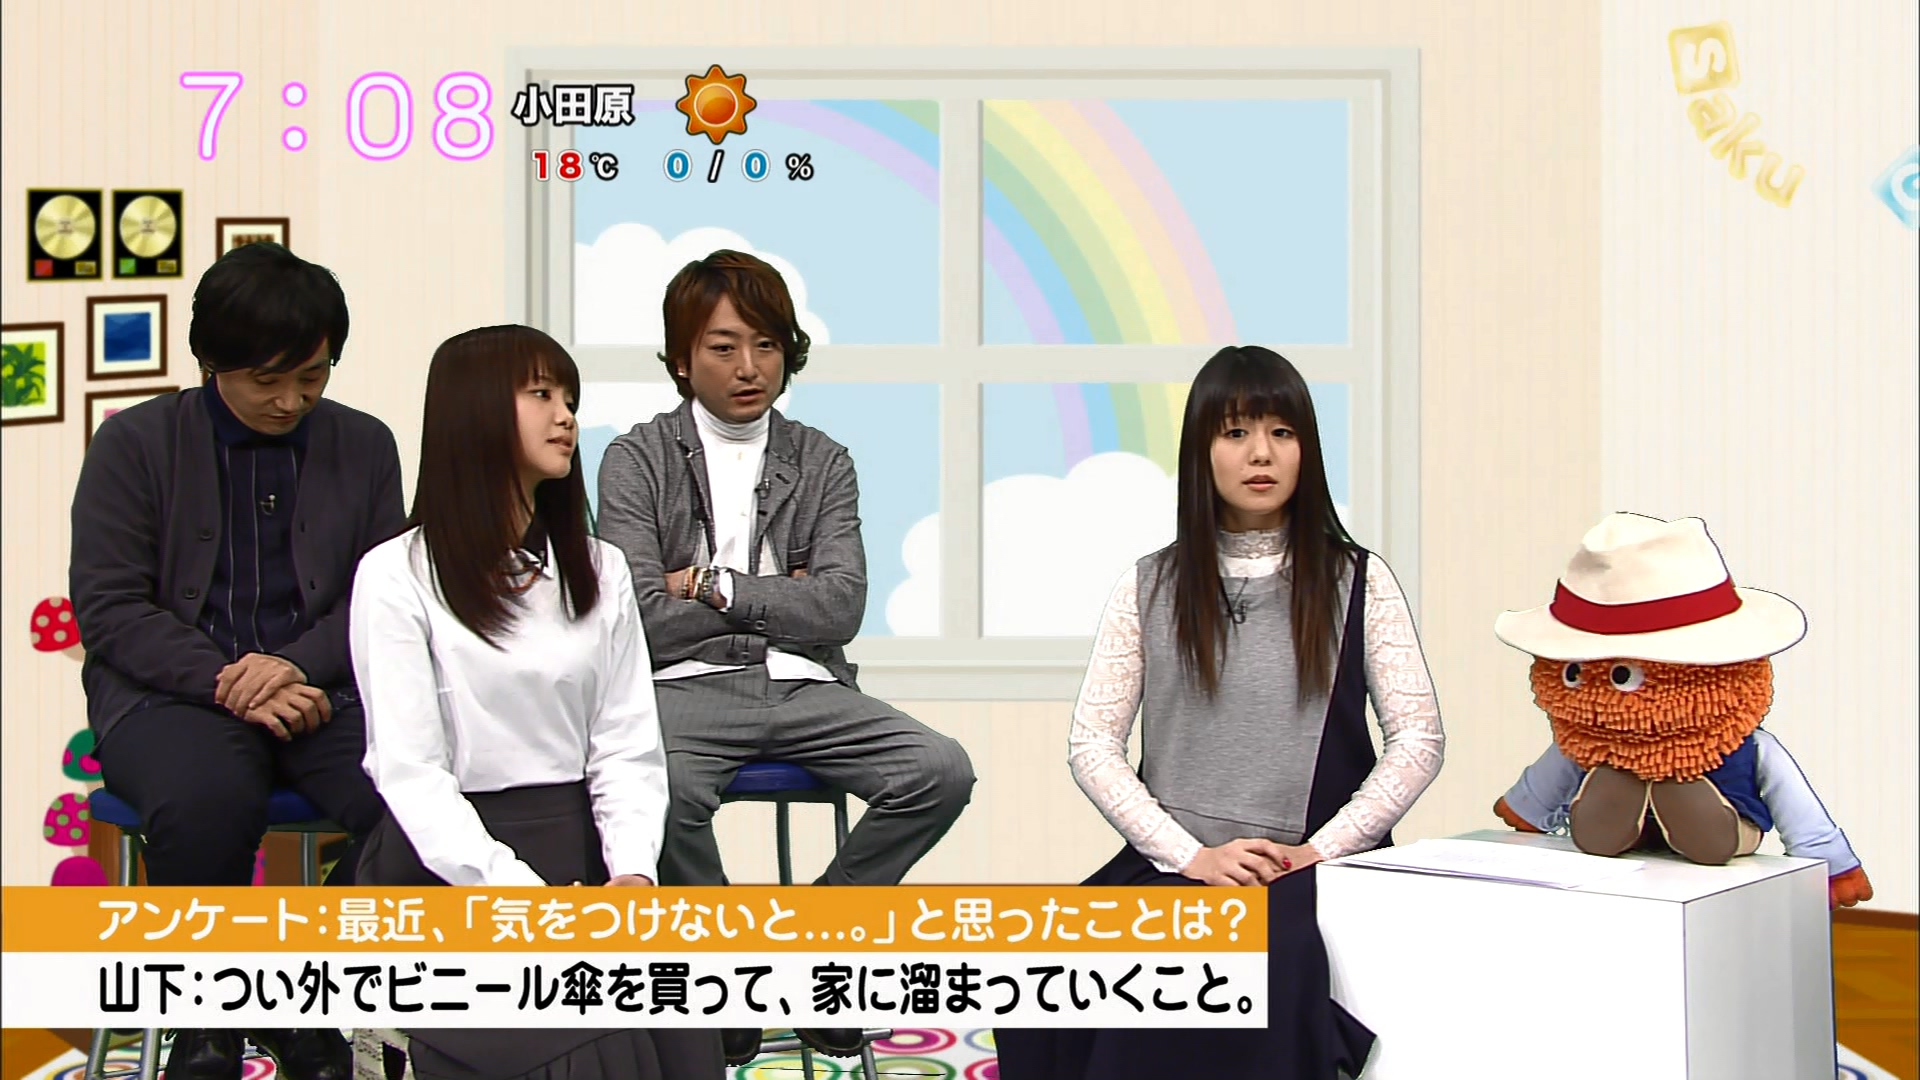 2016.03.17 いきものがかり(saku saku).ts_20160317_080402.716